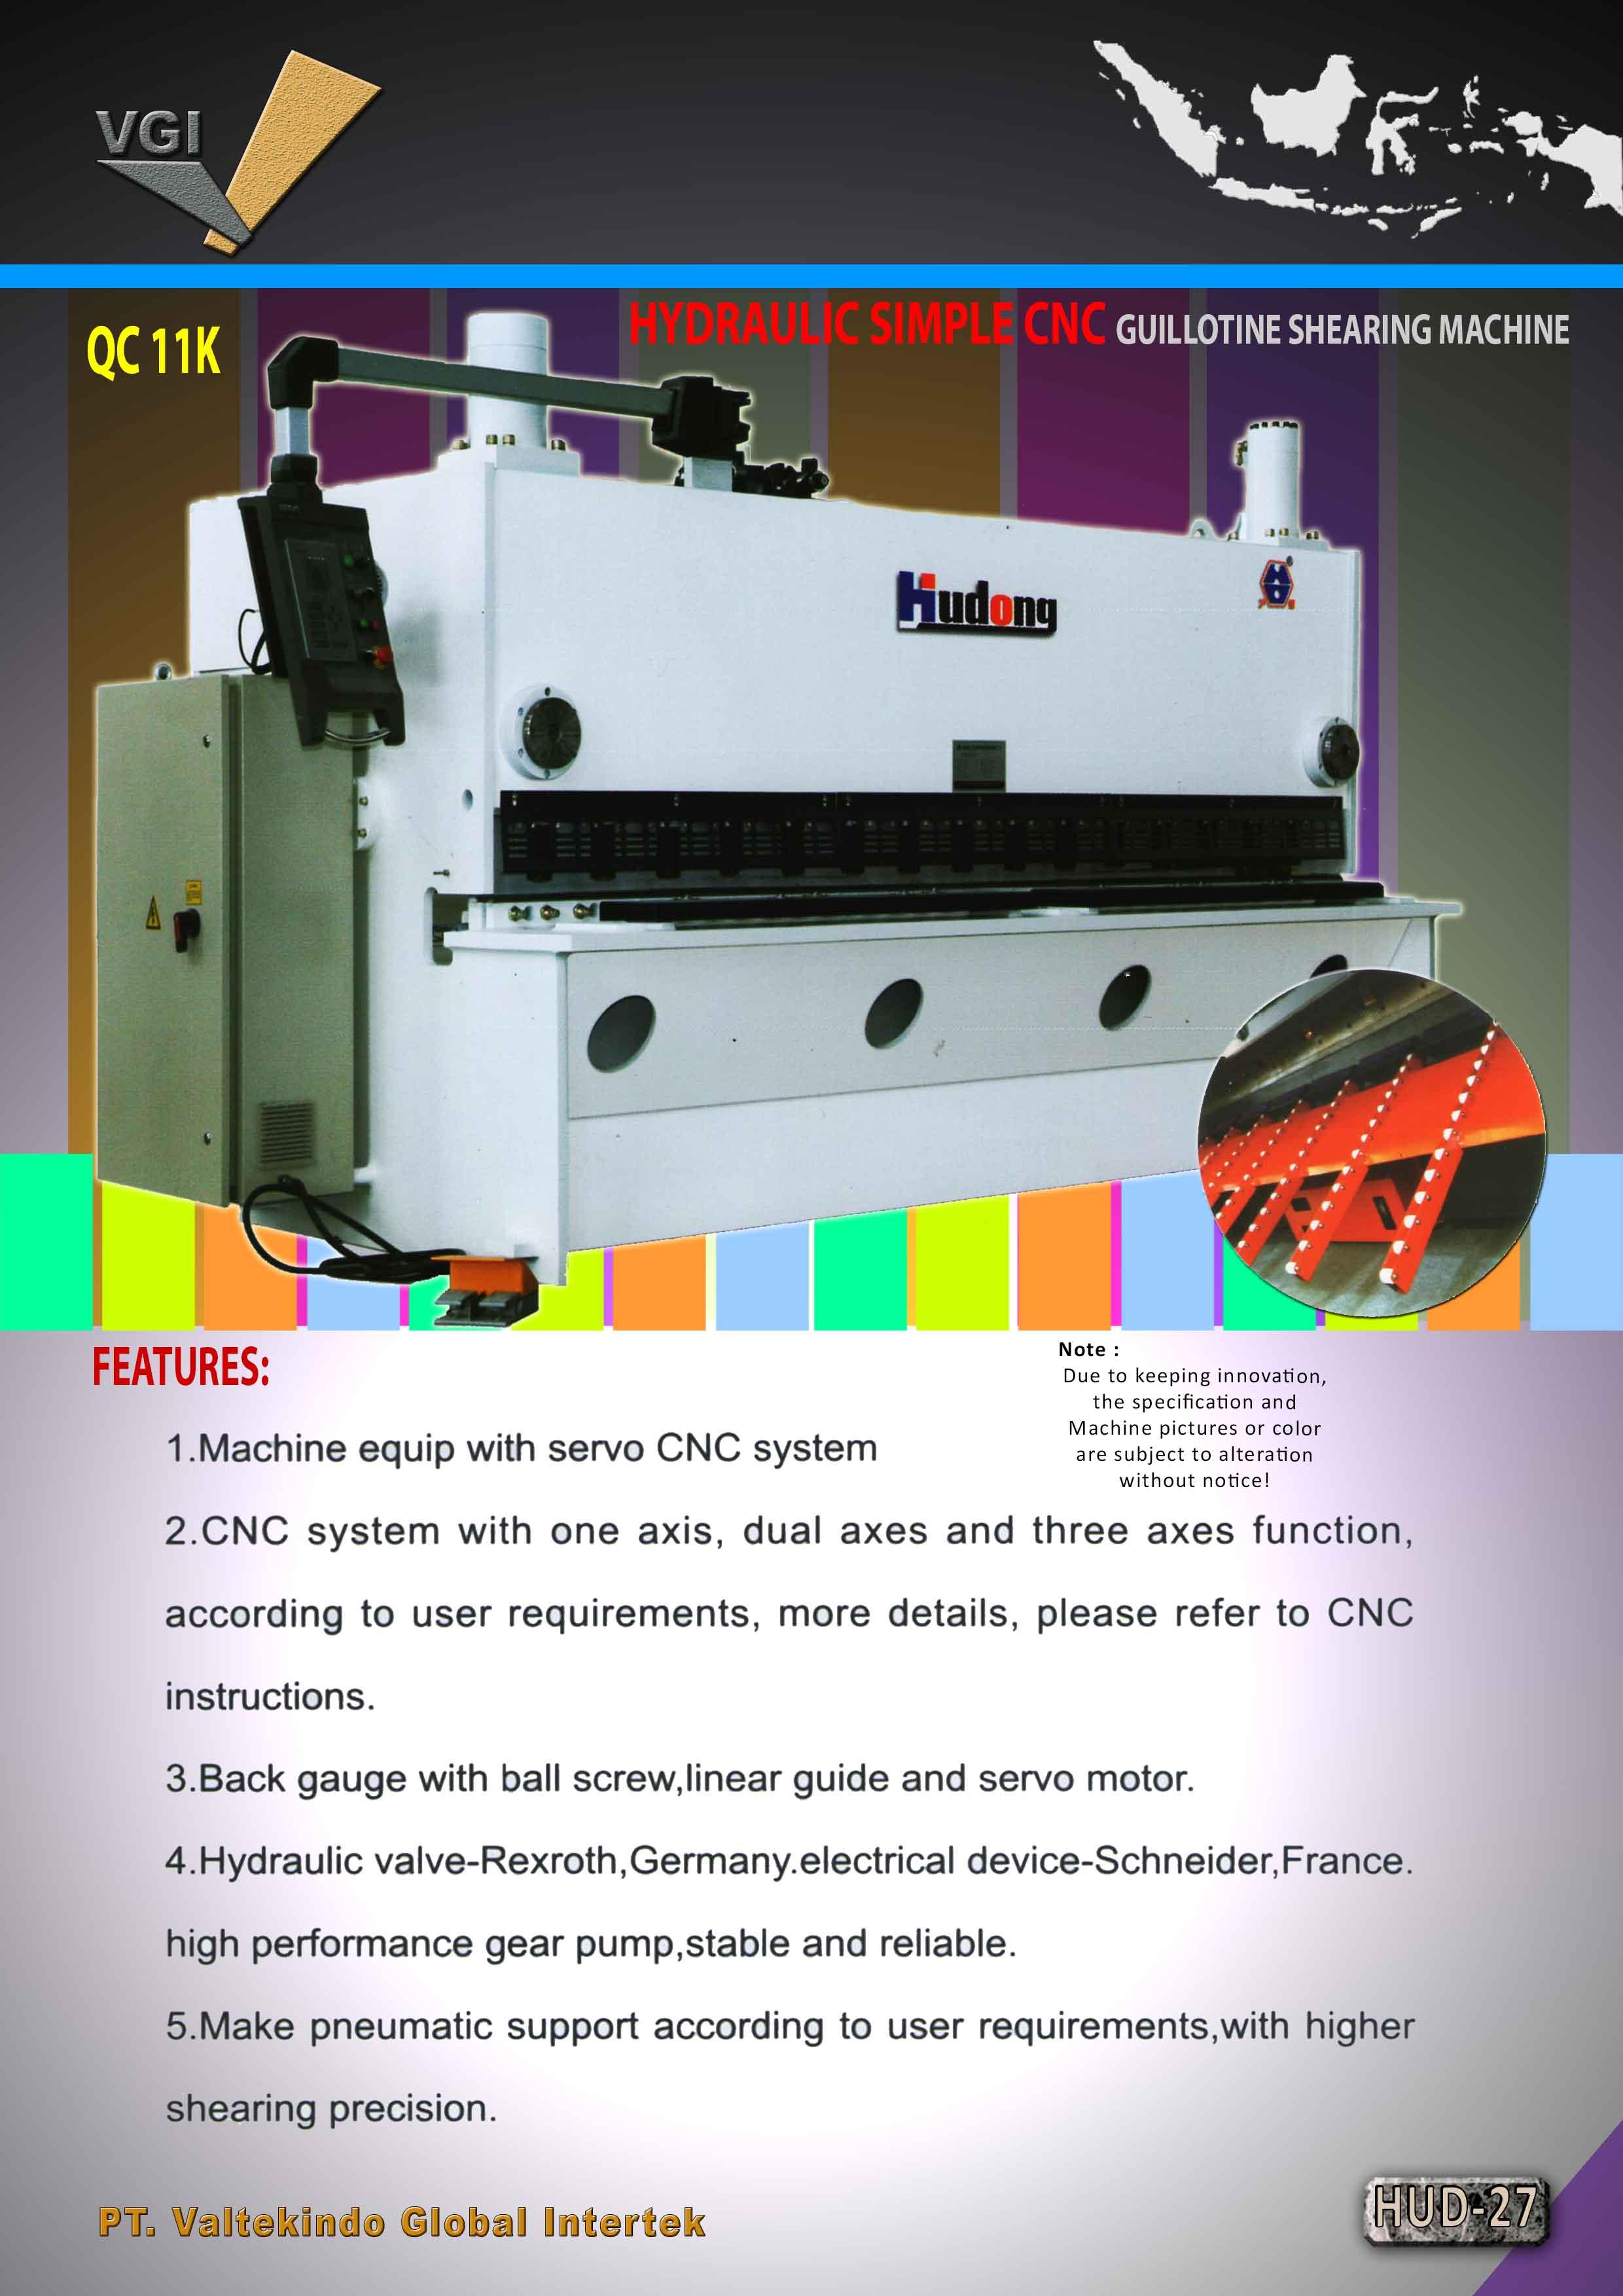 jual mesin Hydraulic Simple Guillotin Shearing Machine